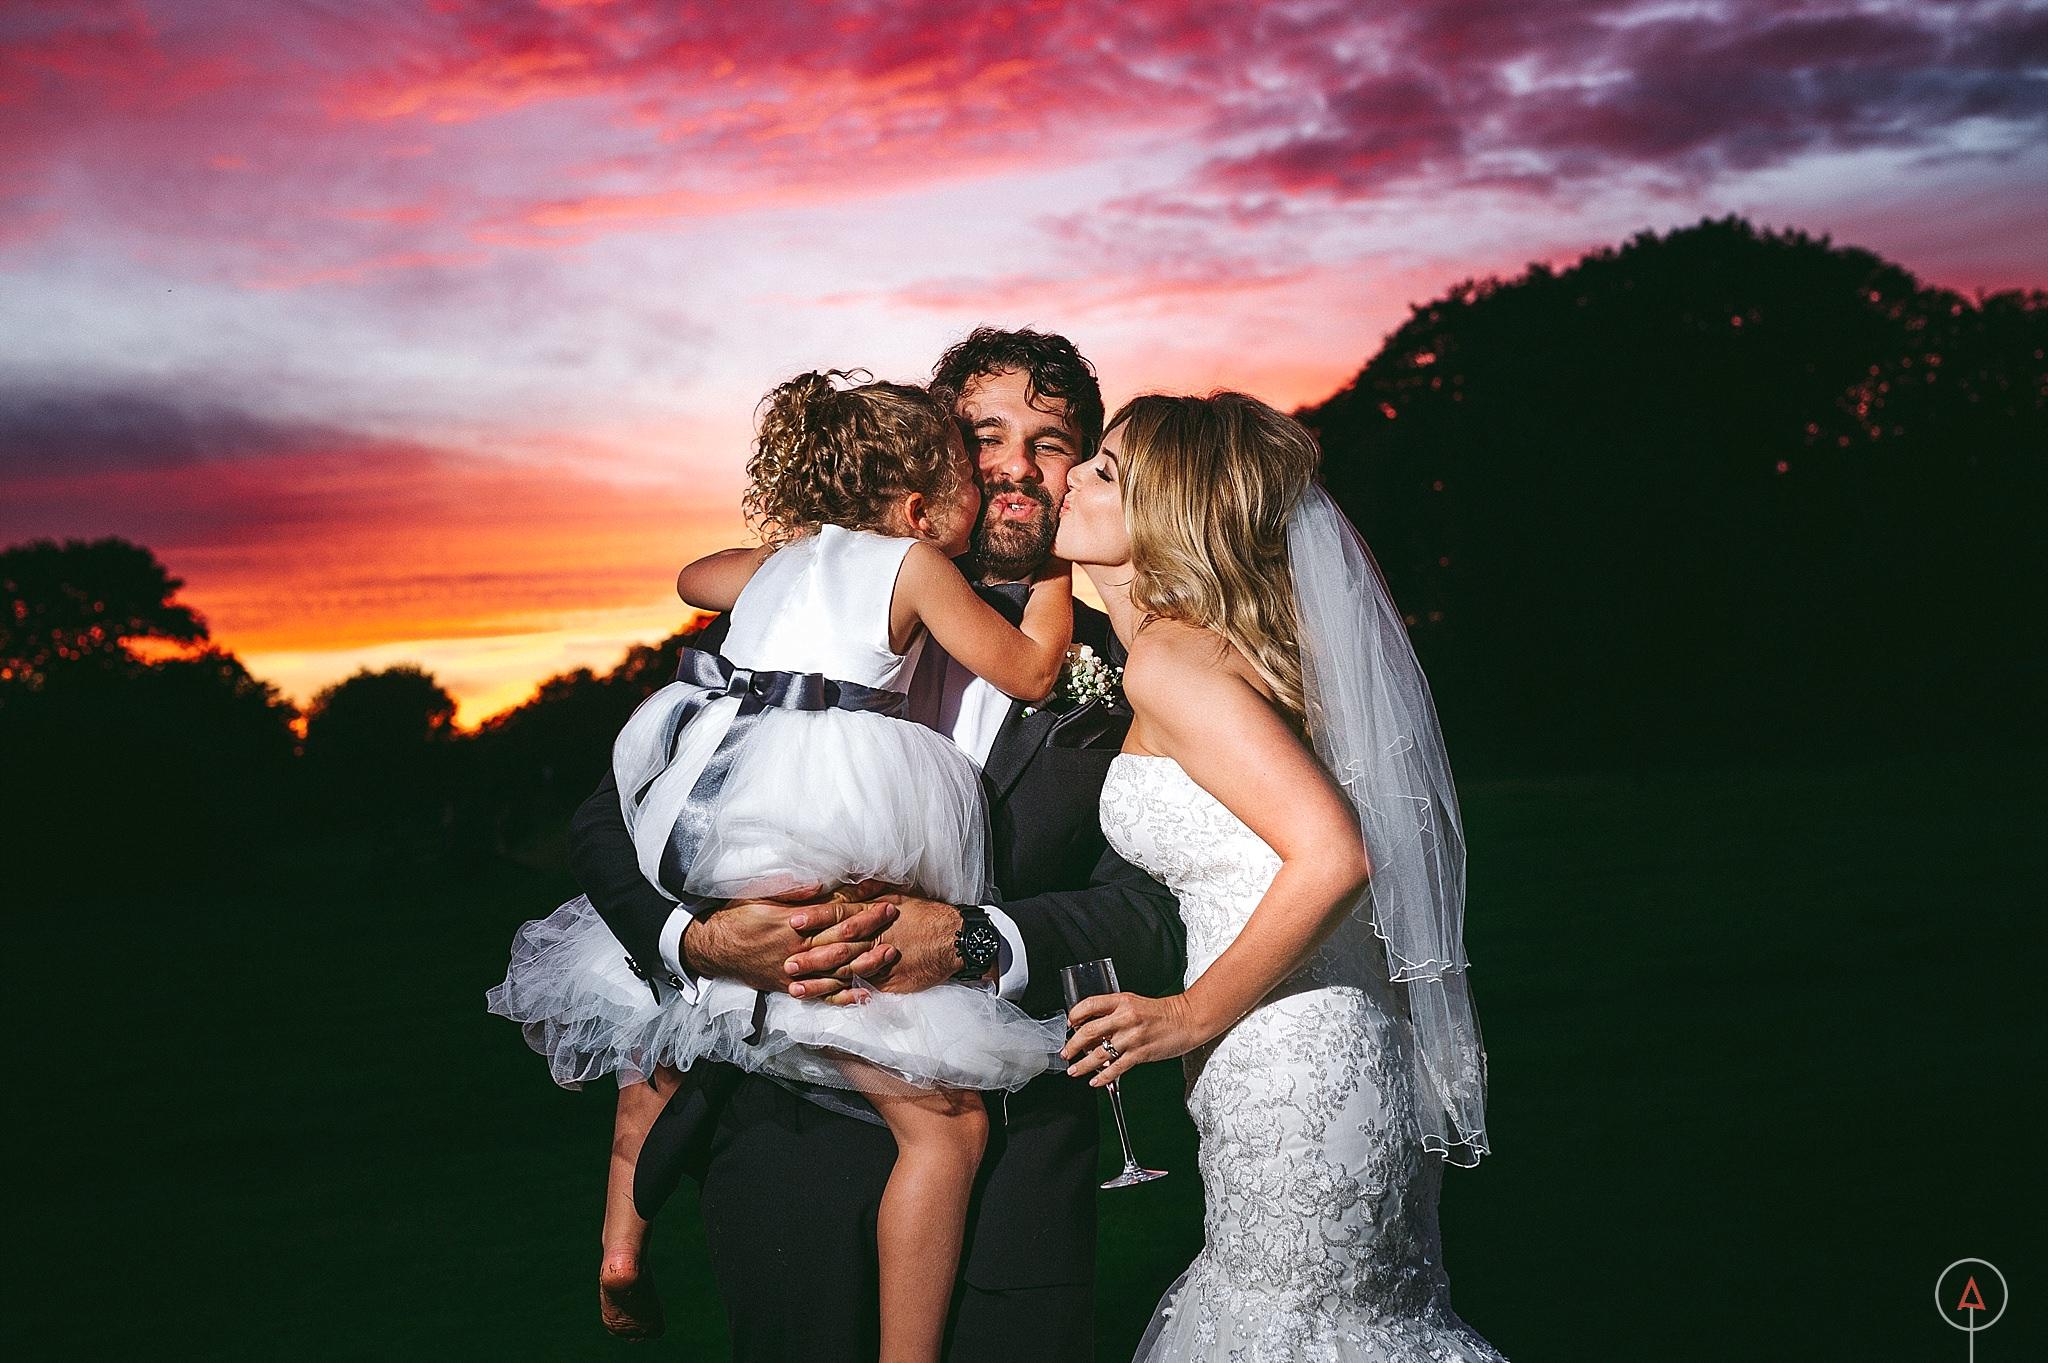 cardiff-wedding-photographer-aga-tomaszek_0414